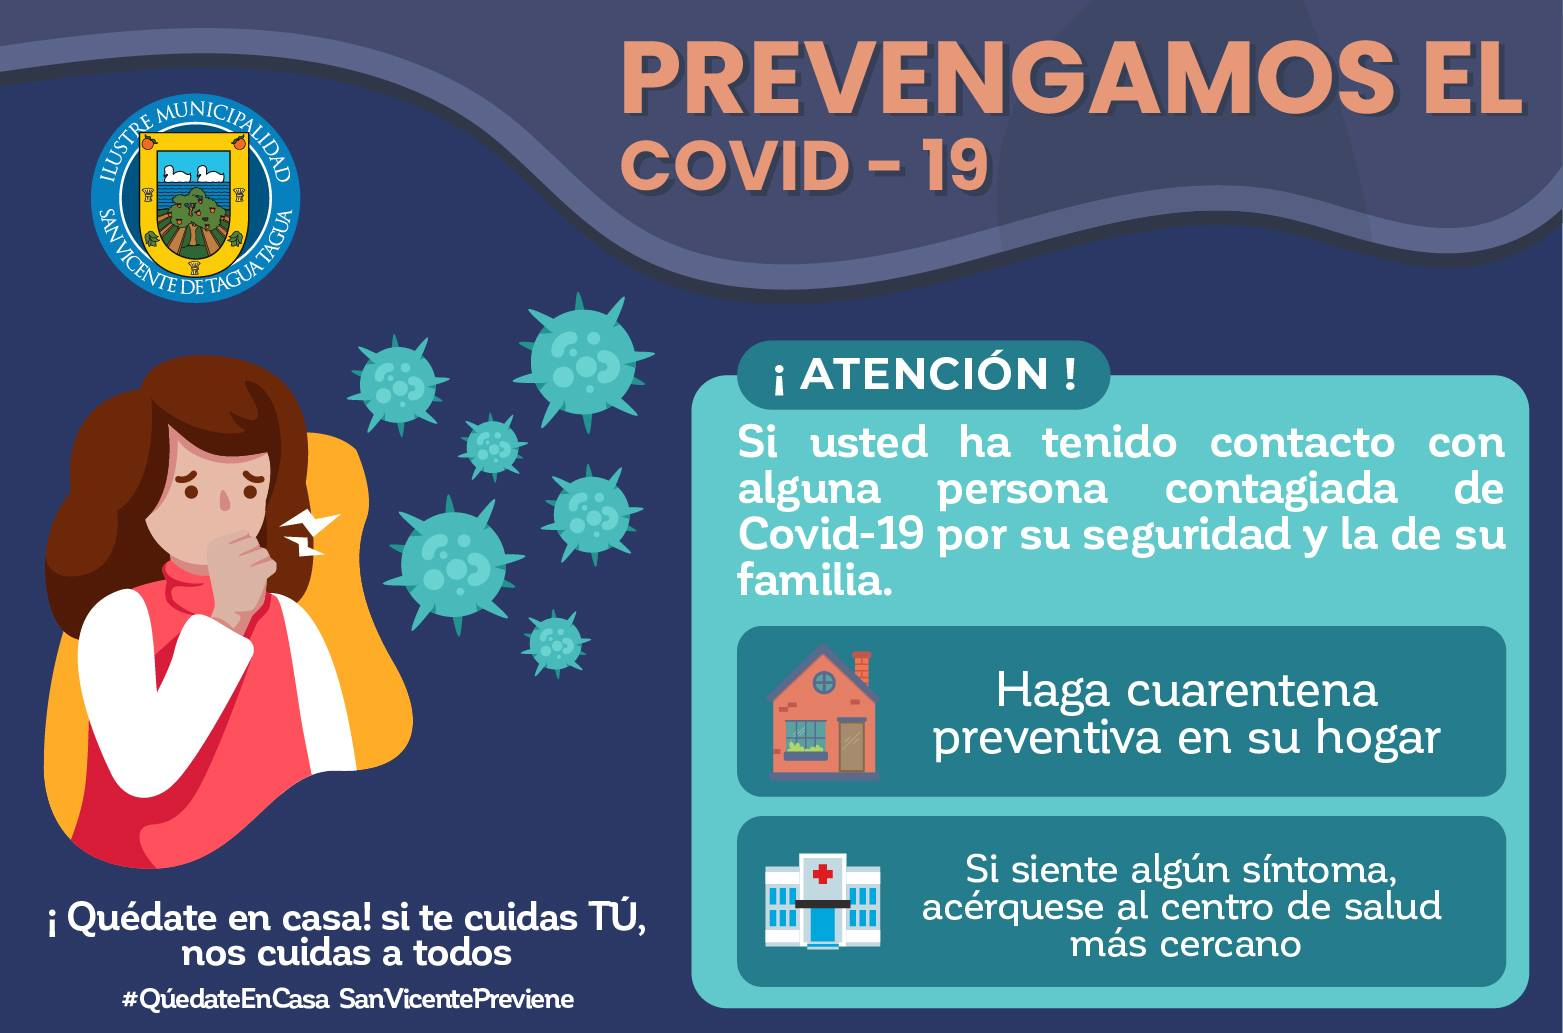 PREVENGAMOS EL COVID-19